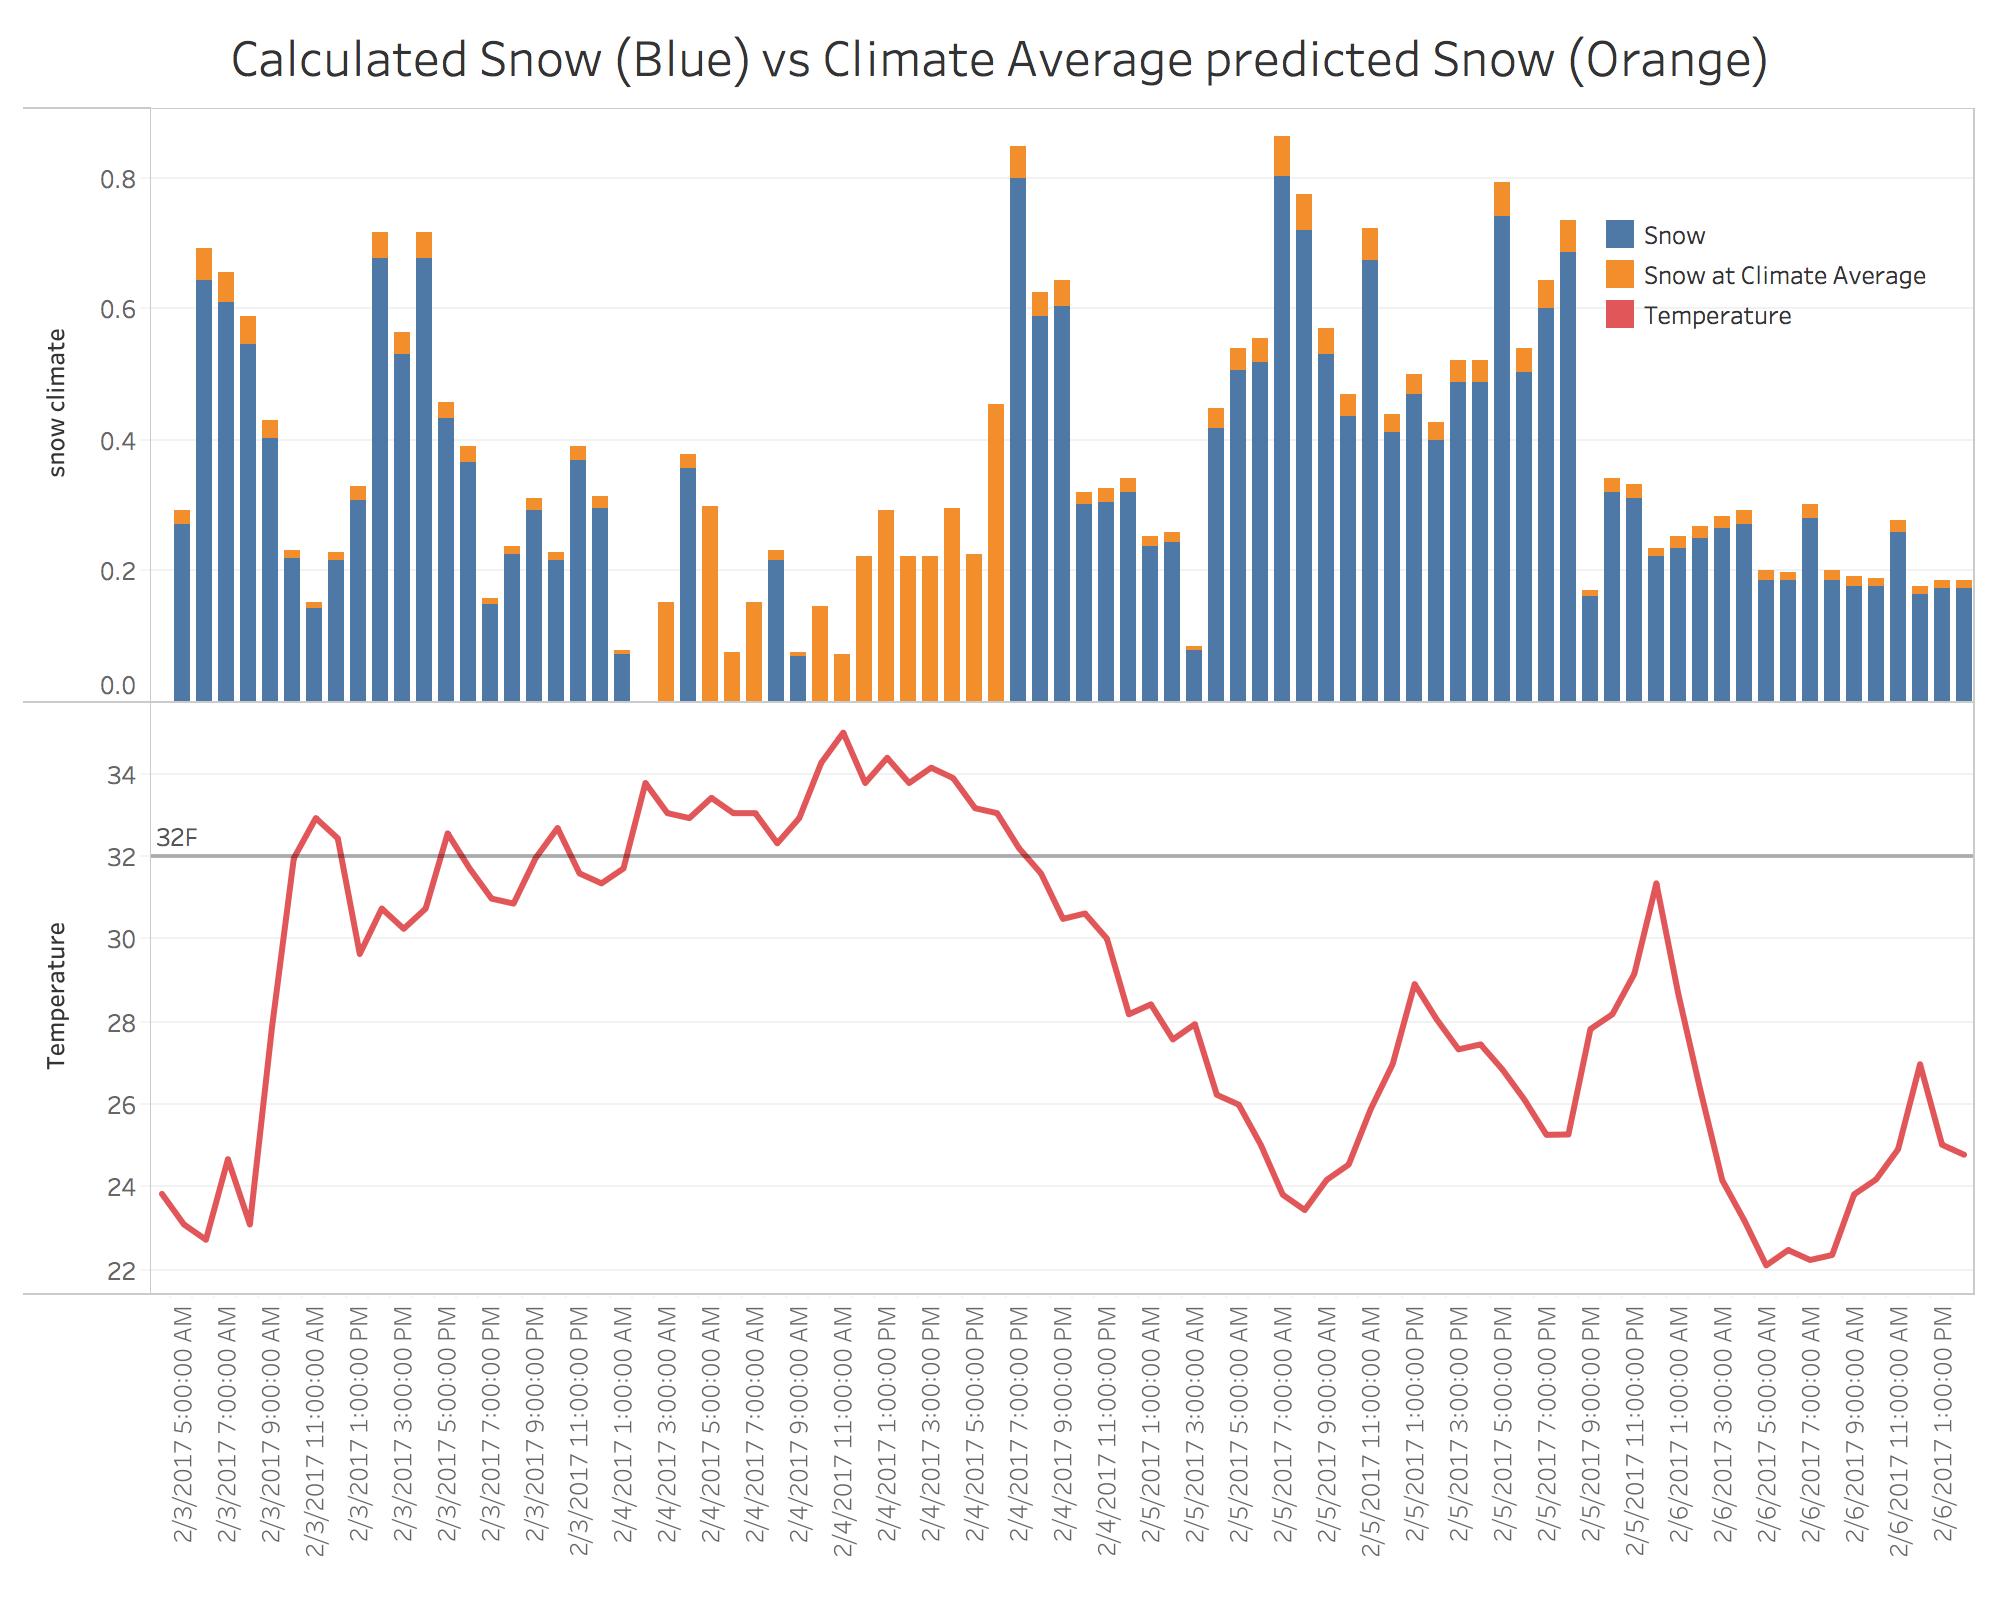 Crystal Snow vs Climate Snow